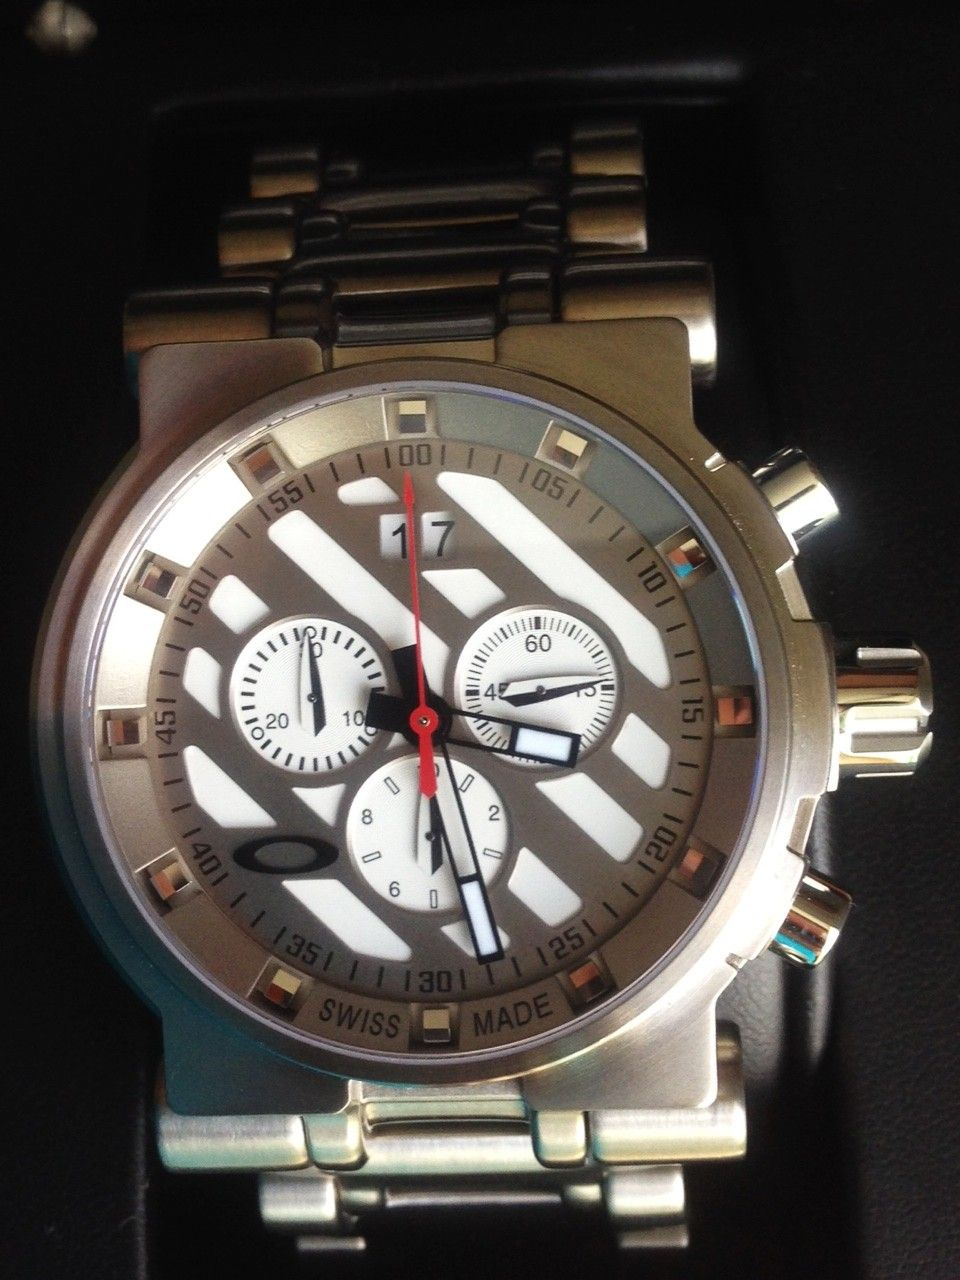 NEW IN BOX Oakley Hollow Point Titanium Watch White Dial 10-046 - 7.JPG